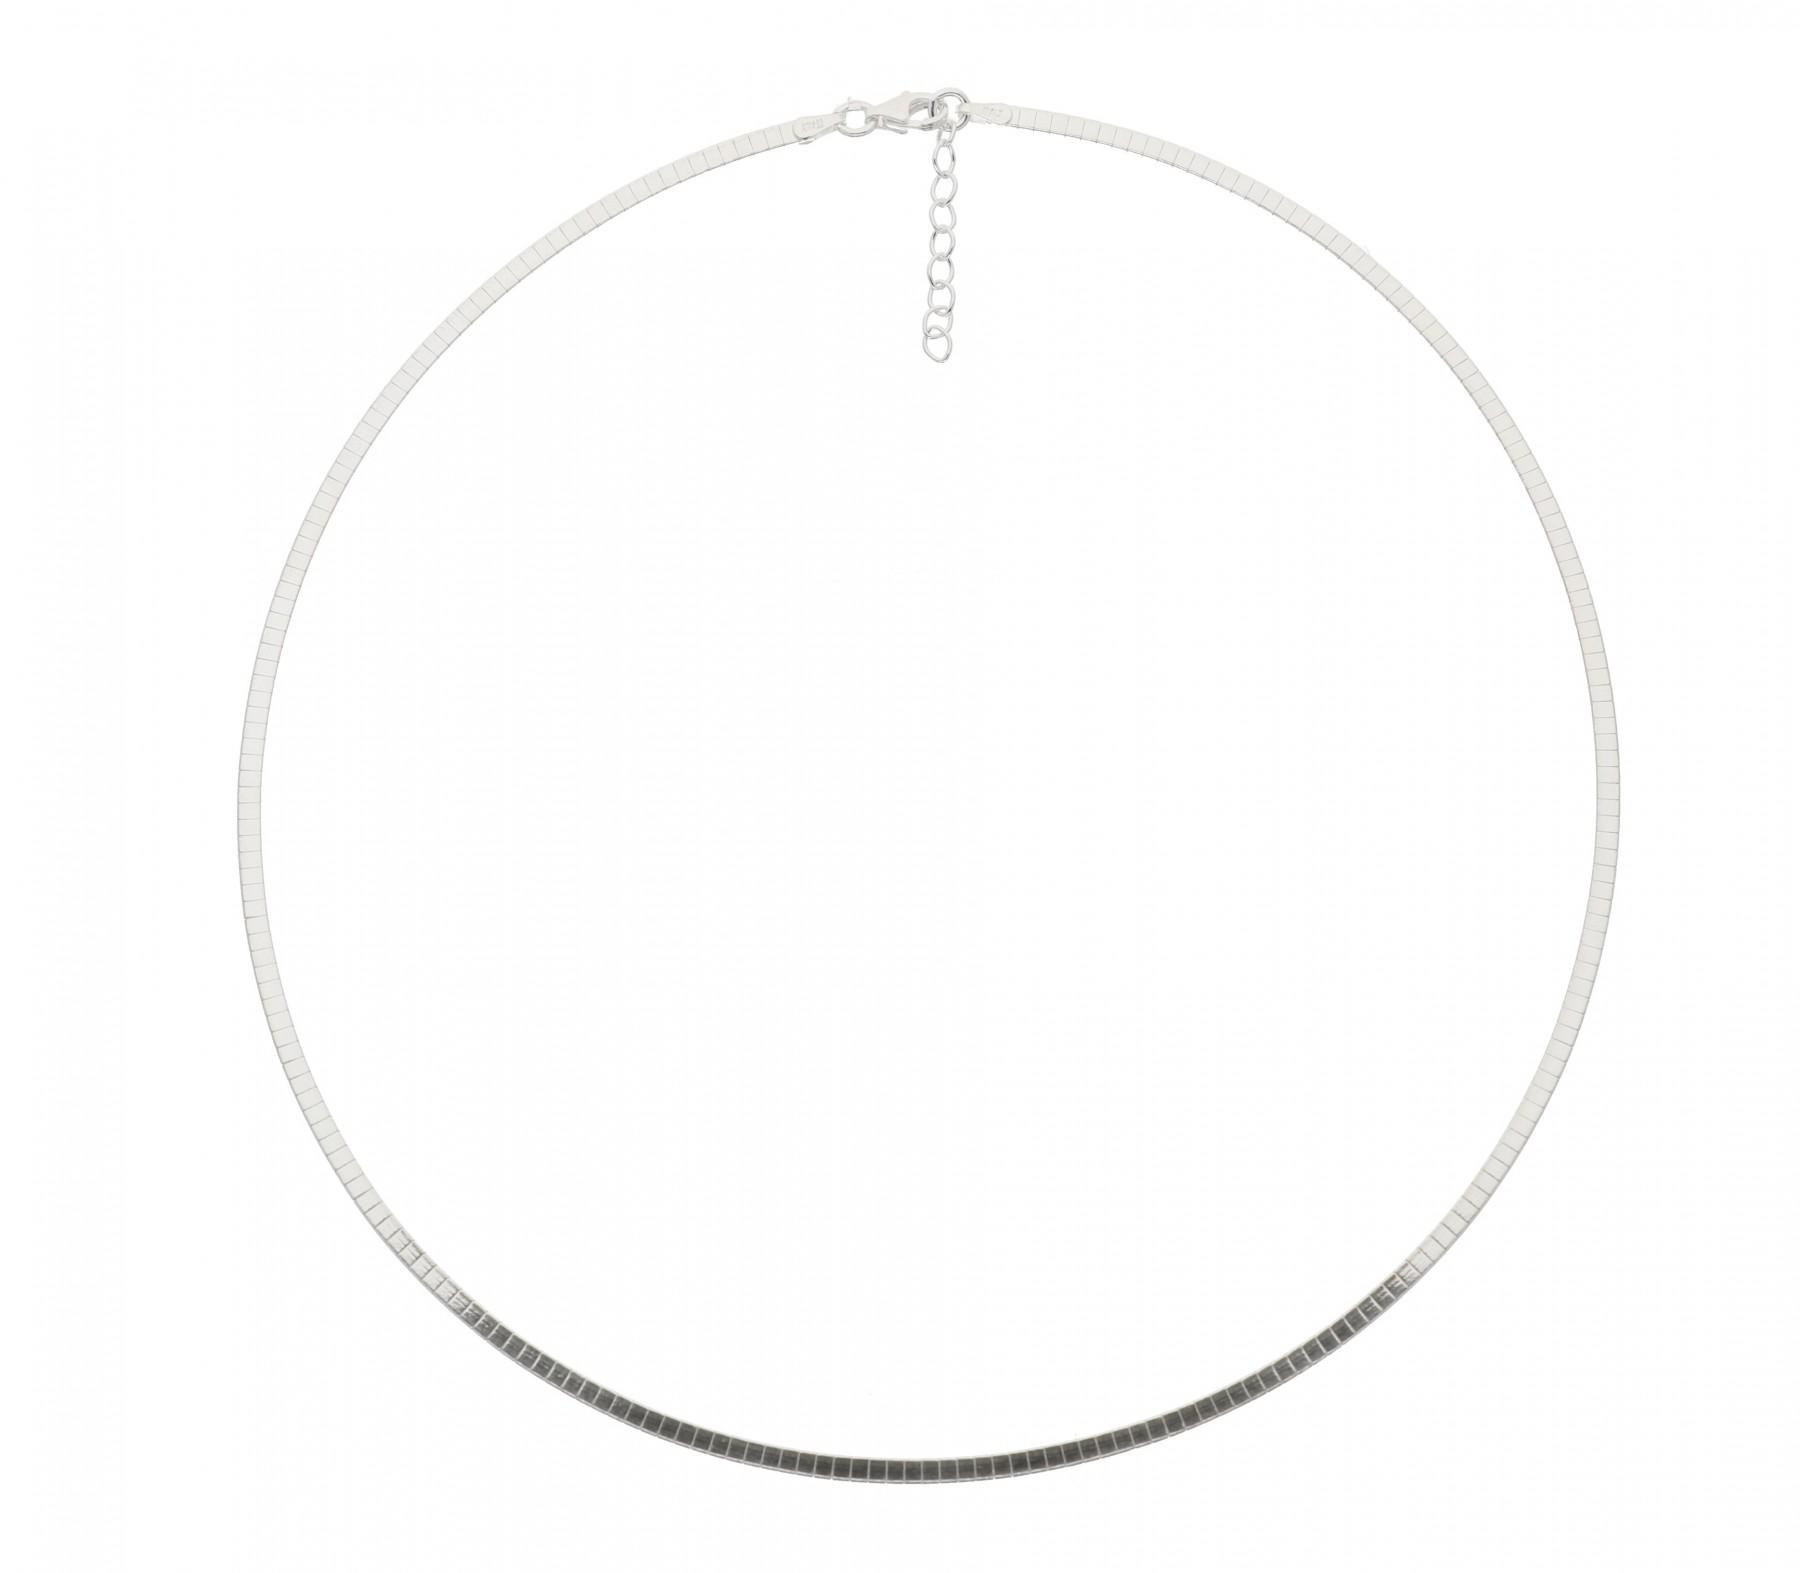 Zilveren omegacollier best basics Halfrond 2.0 mm 103.7035.43